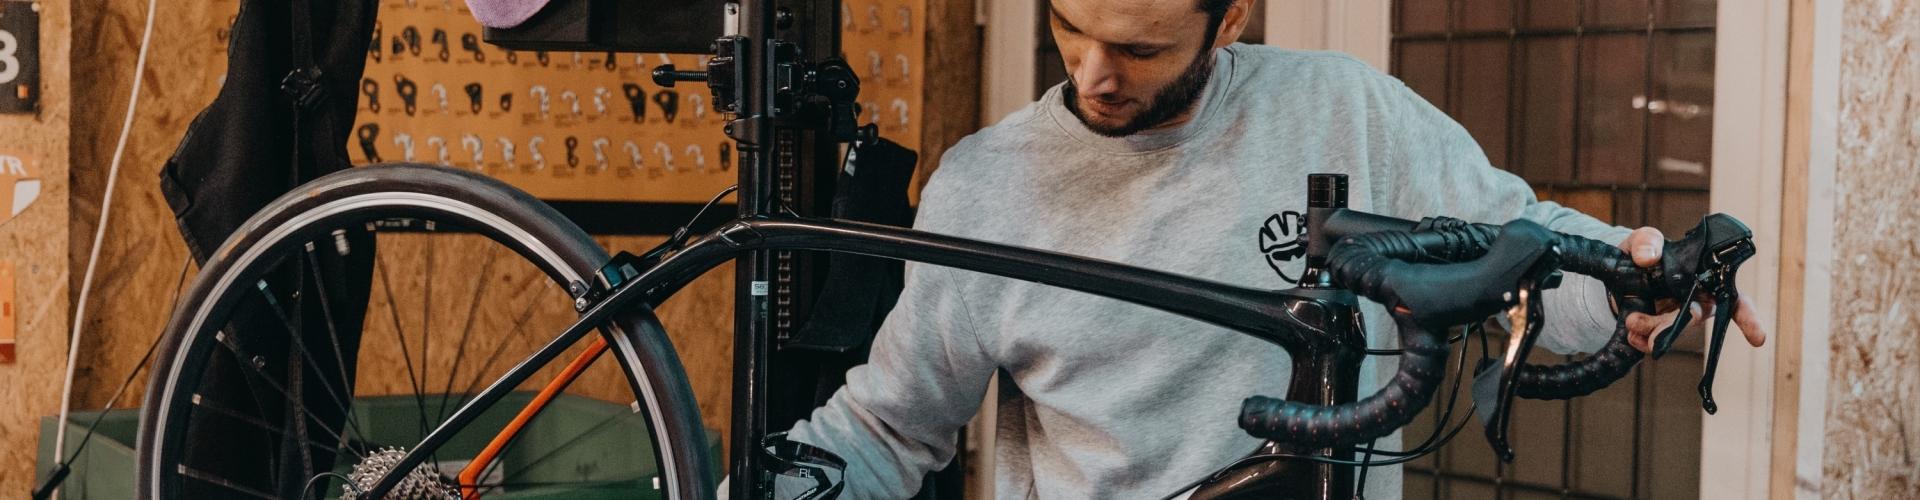 Fietsherstellingen en custom build fietsen